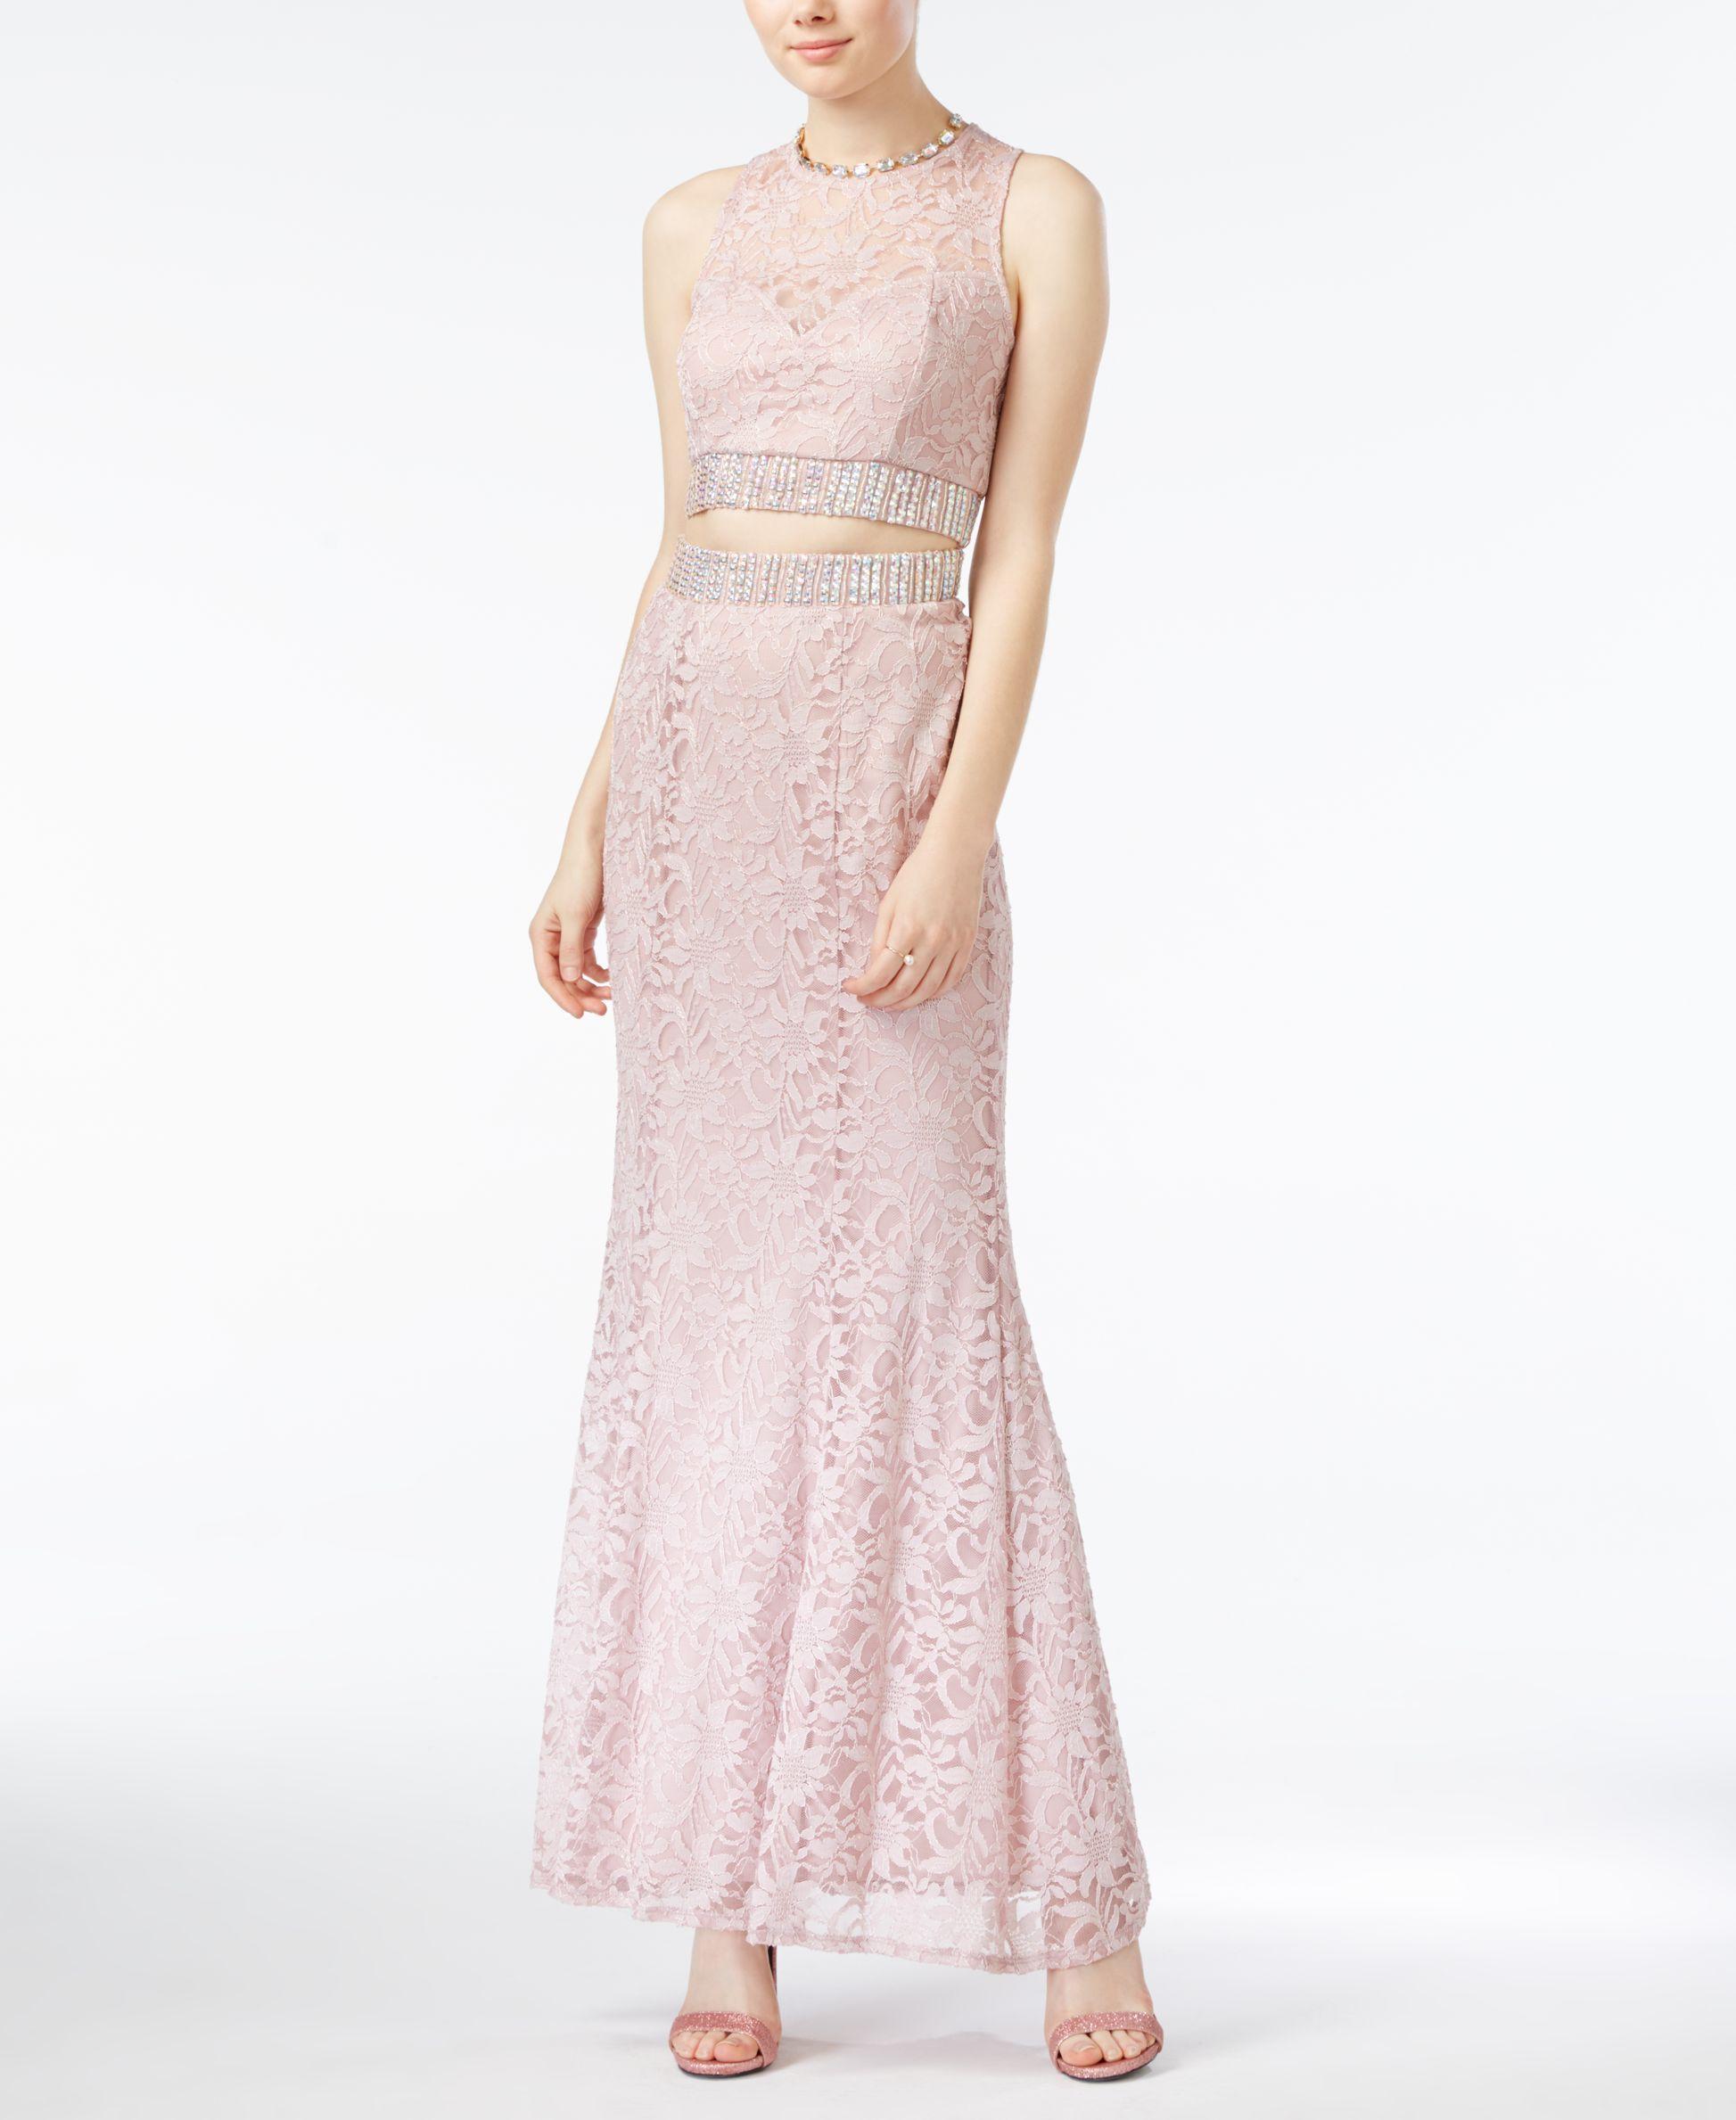 Trixxi juniorsu lace jeweltrim twopiece dress products